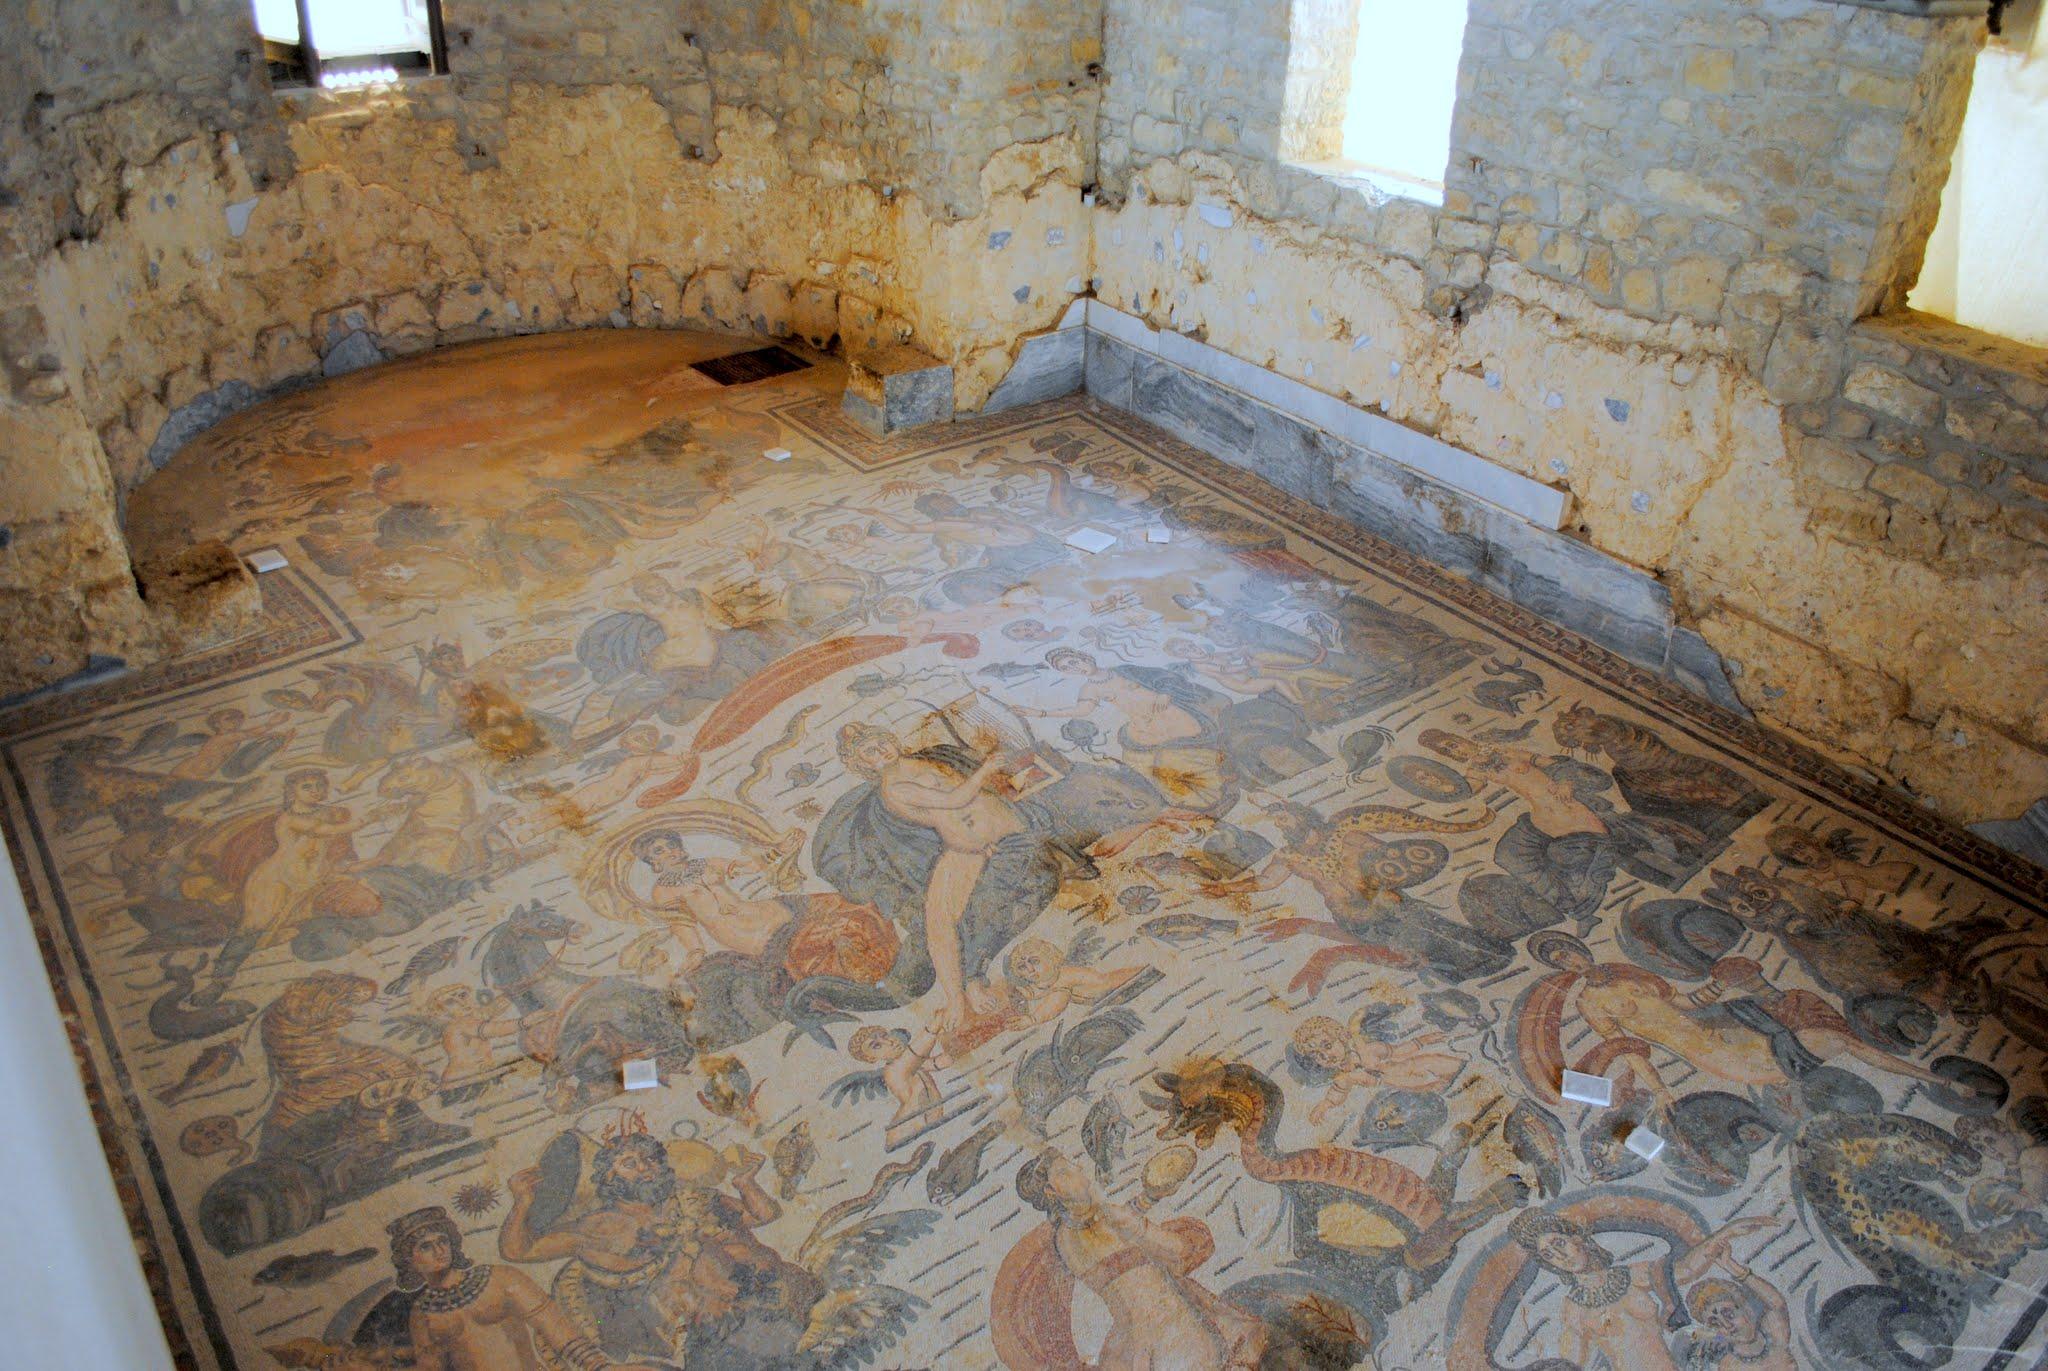 My Photos: Italy -- Mosaics -- Sicily -- Piazza Armerina -- The Room of the Arion Mosaic